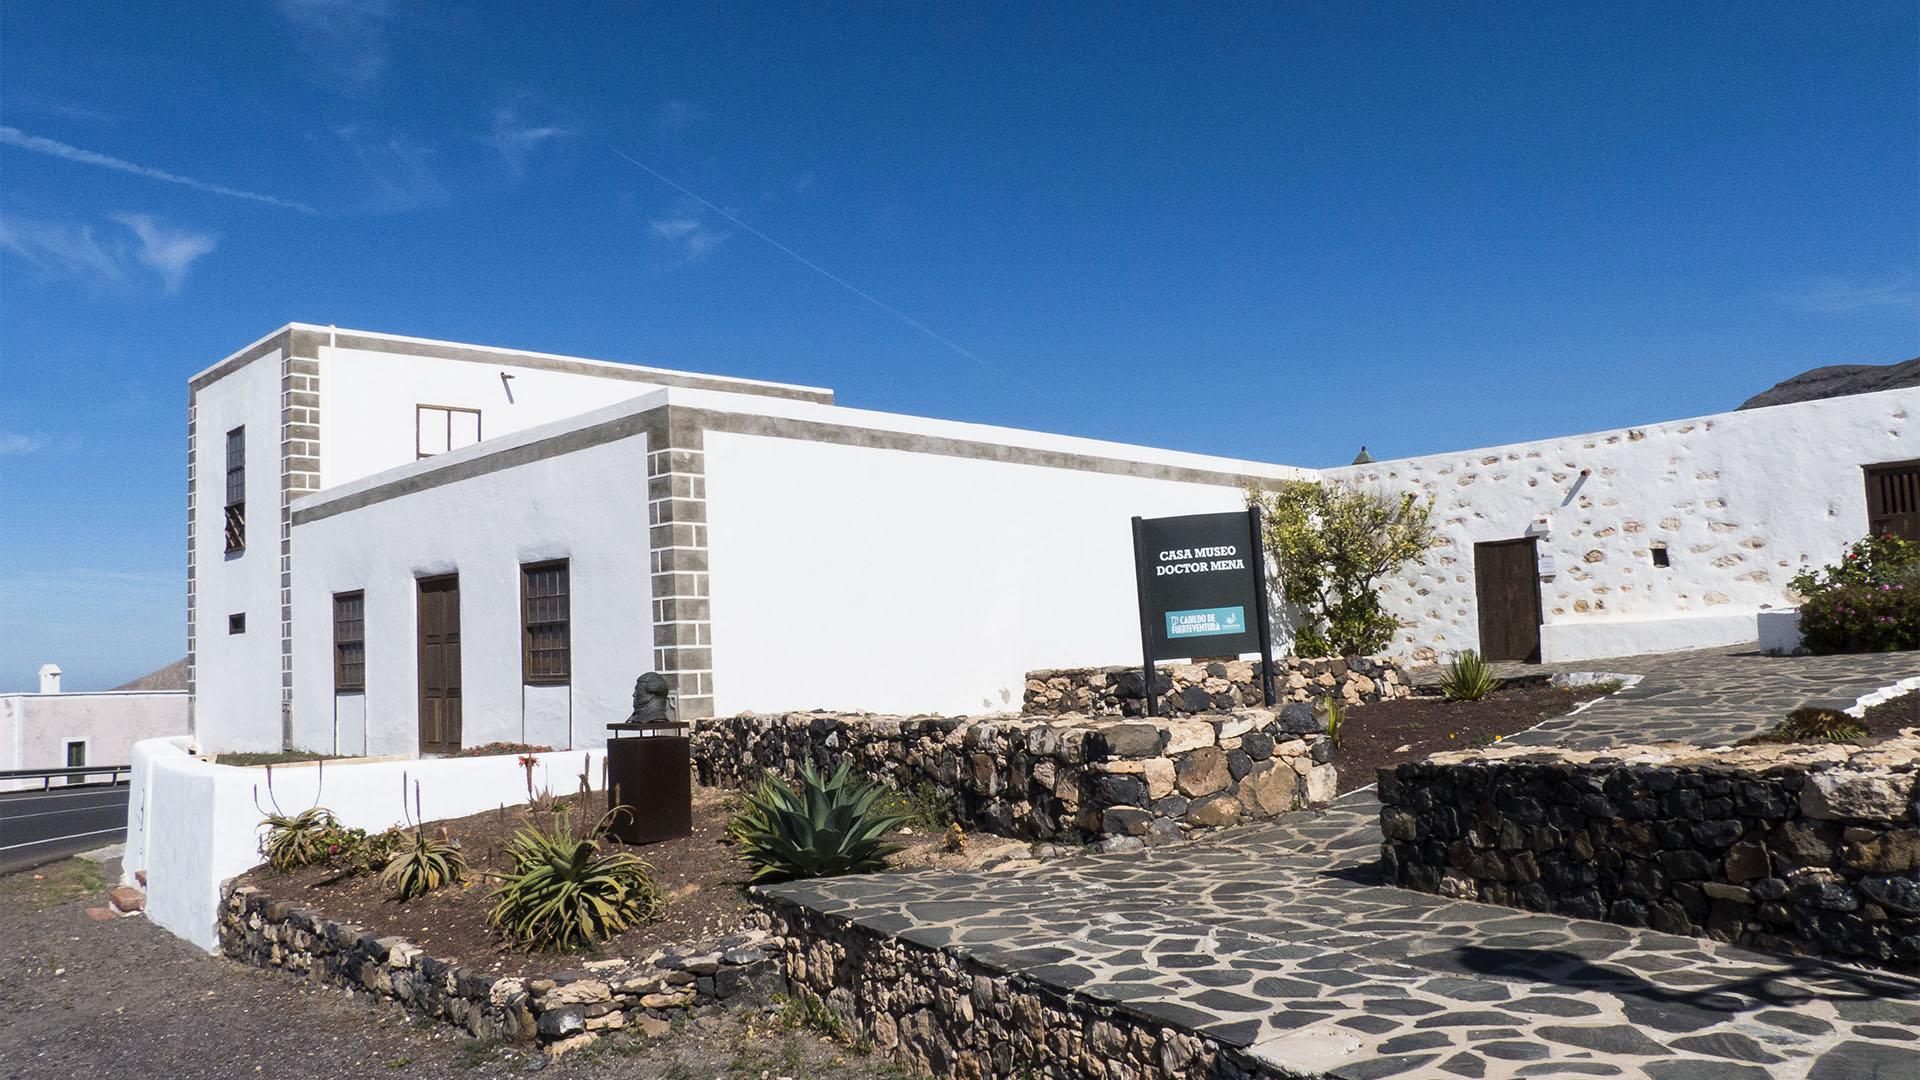 Casa Museo Doctor Mena, Ampuyenta, Museo de la Sal, Fuerteventura, Canary Islands, www.sunnyfuerte.com, sunnyfuerte